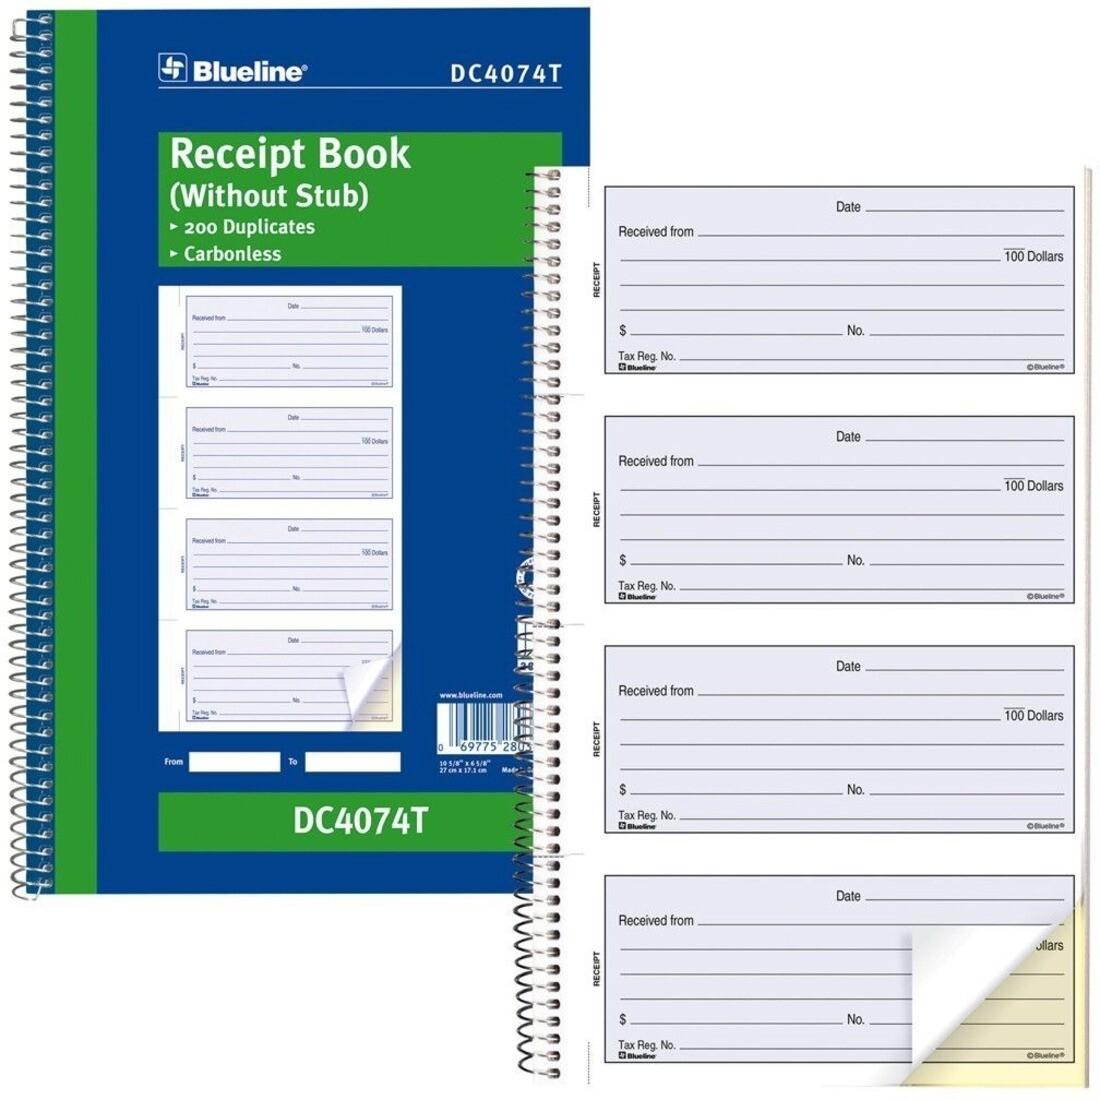 "Receipt Book Stubless, Blueline 200 Duplicates, 6 5/8"" x 10 5/8"""